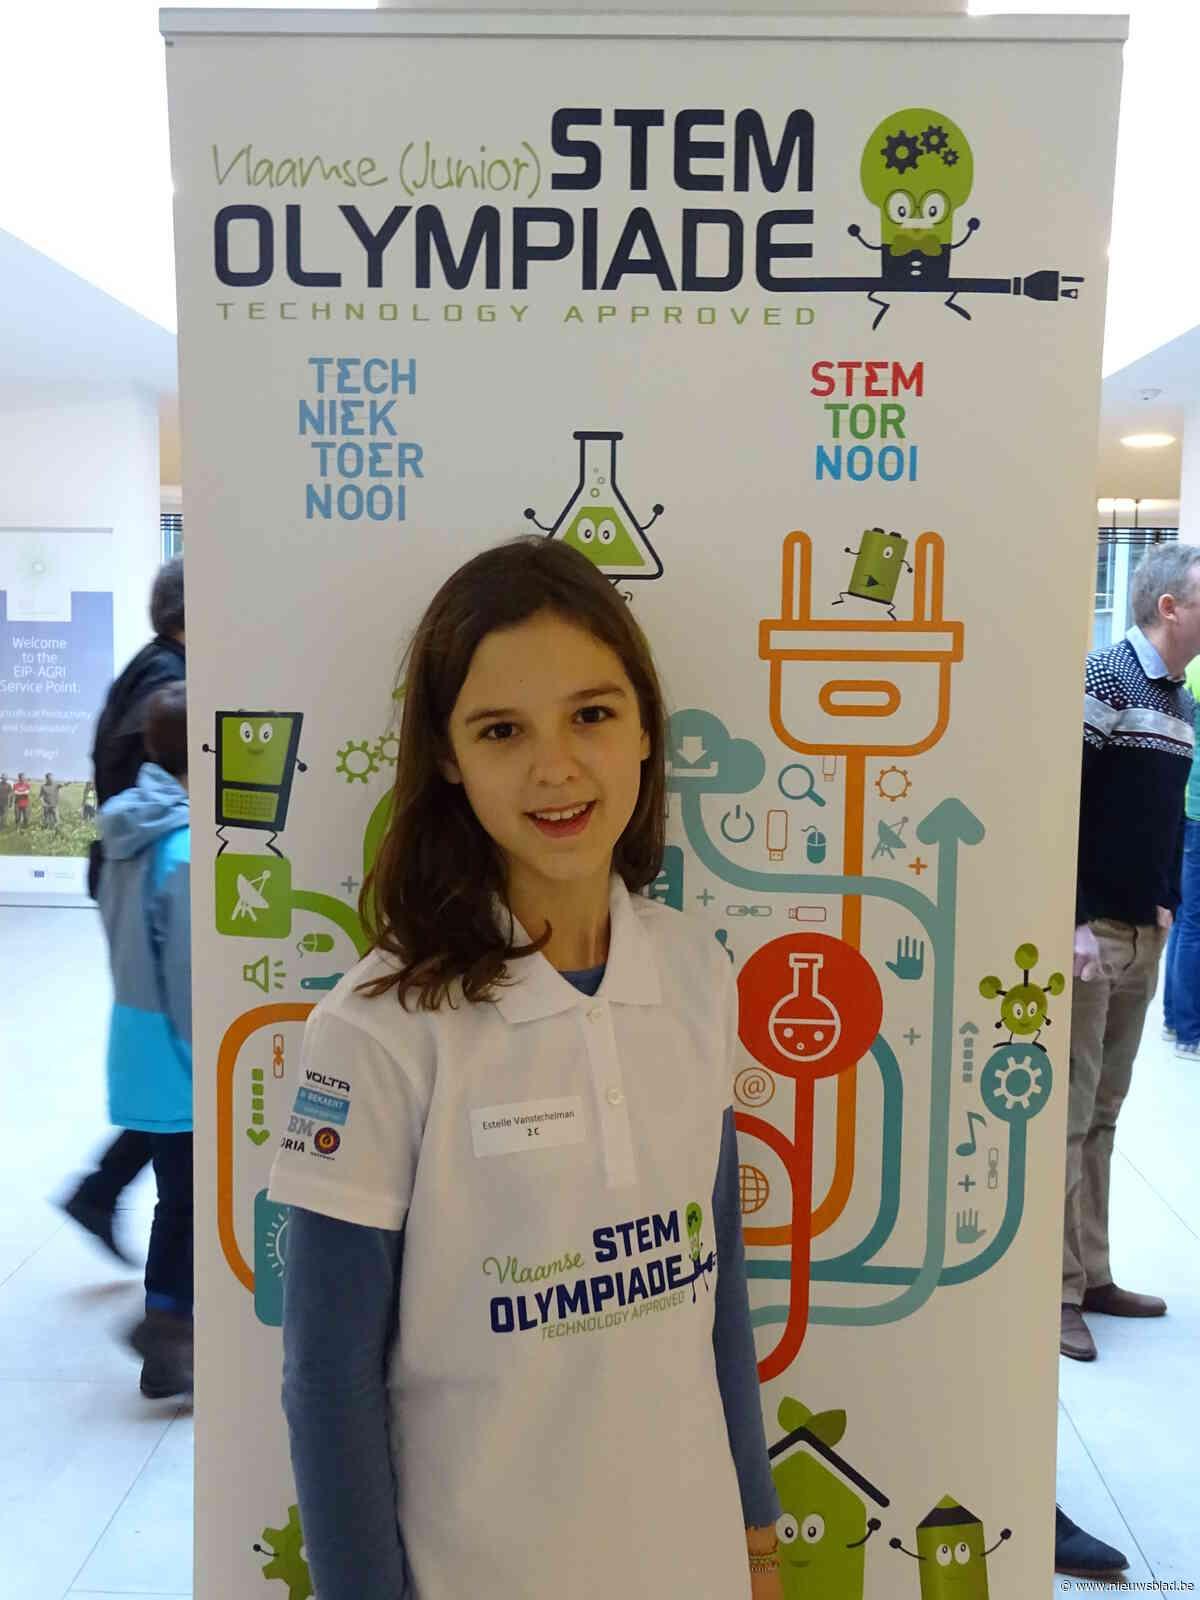 Brons voor Estelle Vanstechelman op Vlaamse Junior STEM Olympiade